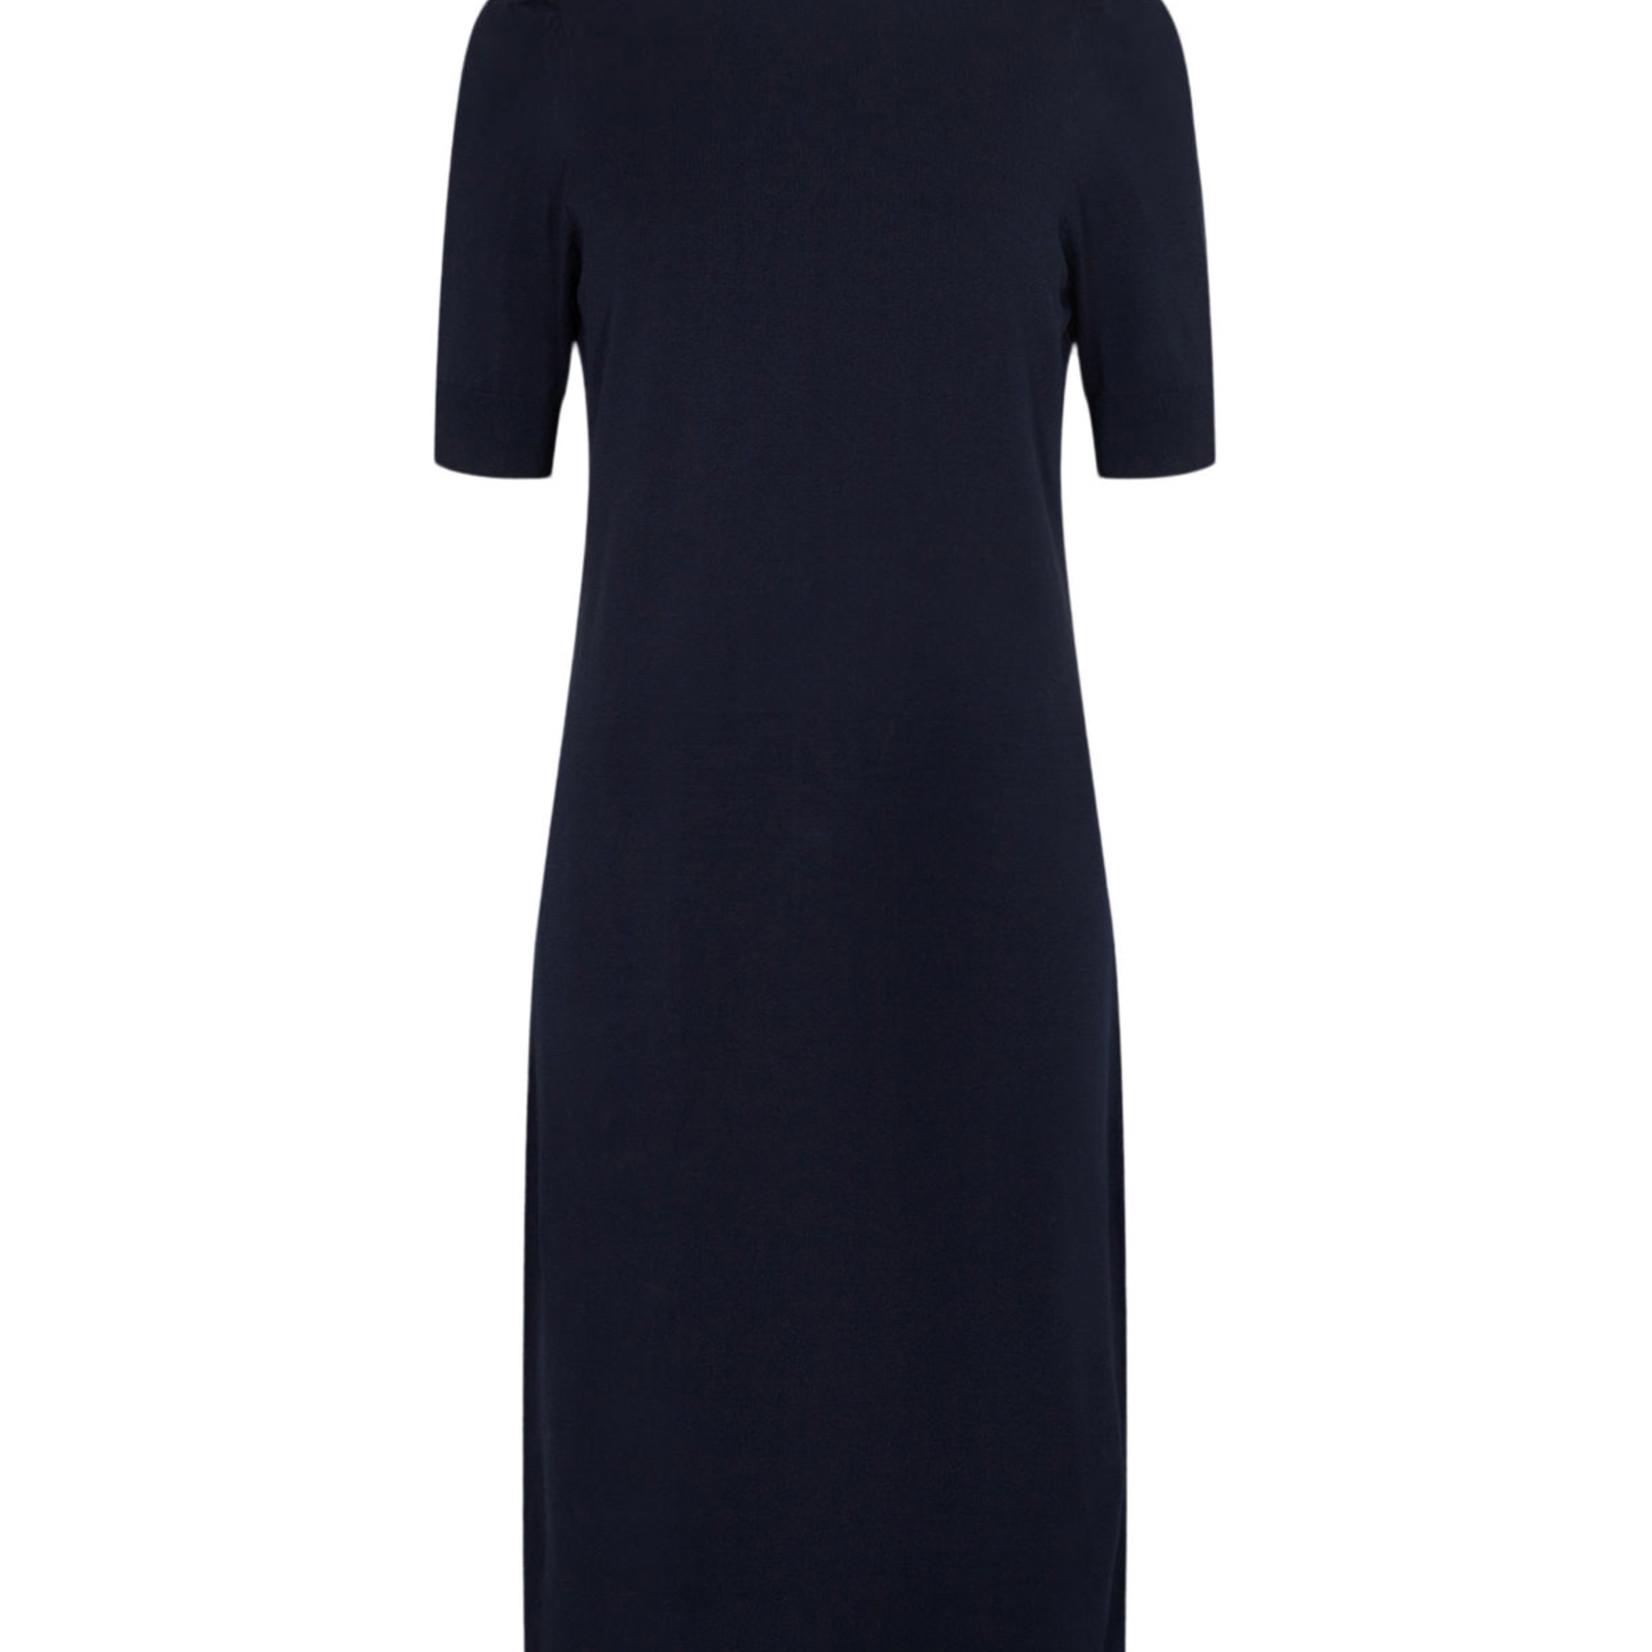 NÜMPH NUCARYN, dress